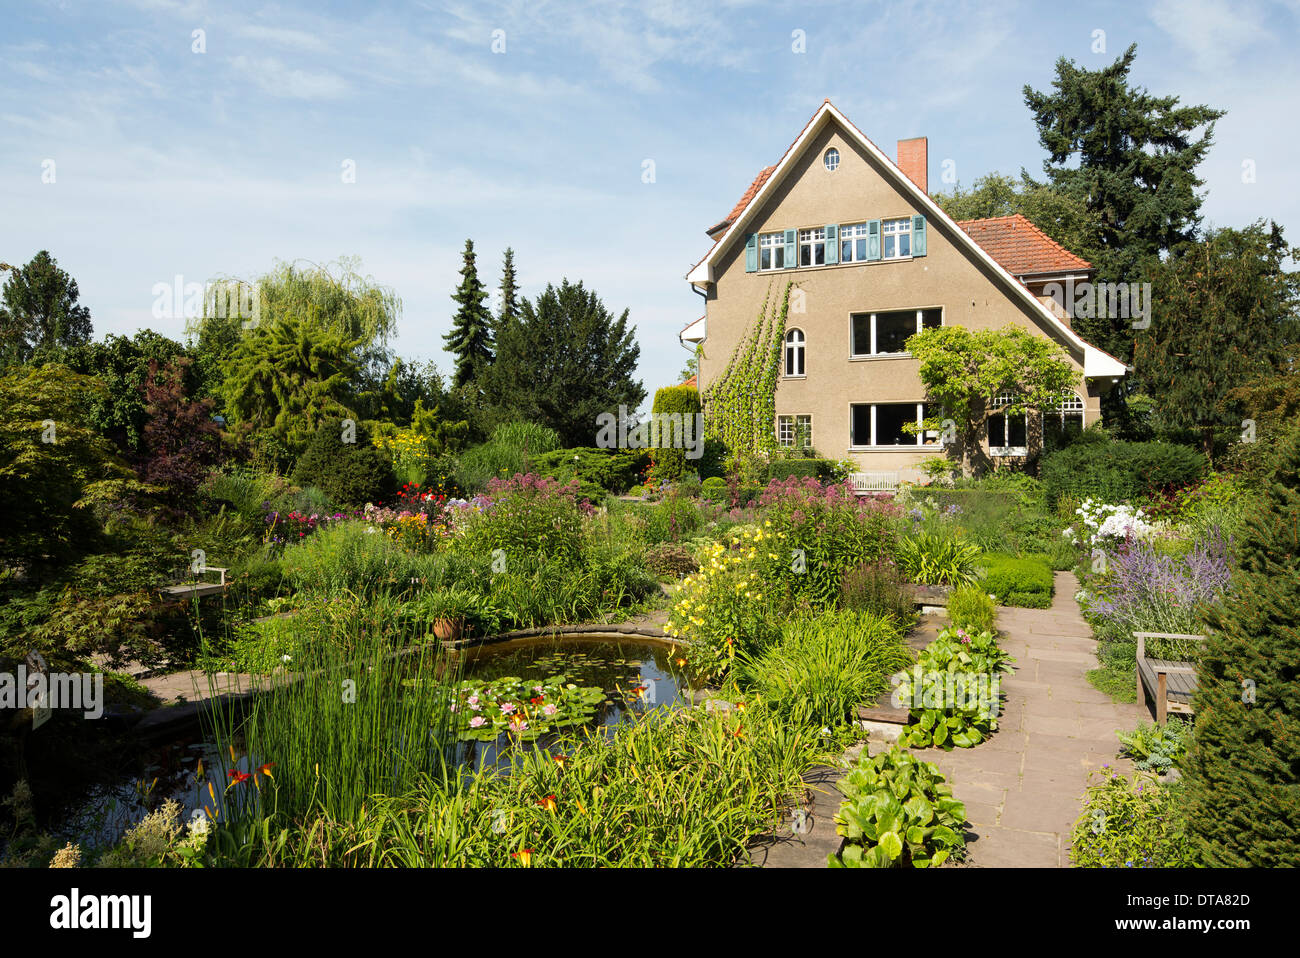 Potsdam Bornim Karl Foerster Garten Stock Photo 66608709 Alamy